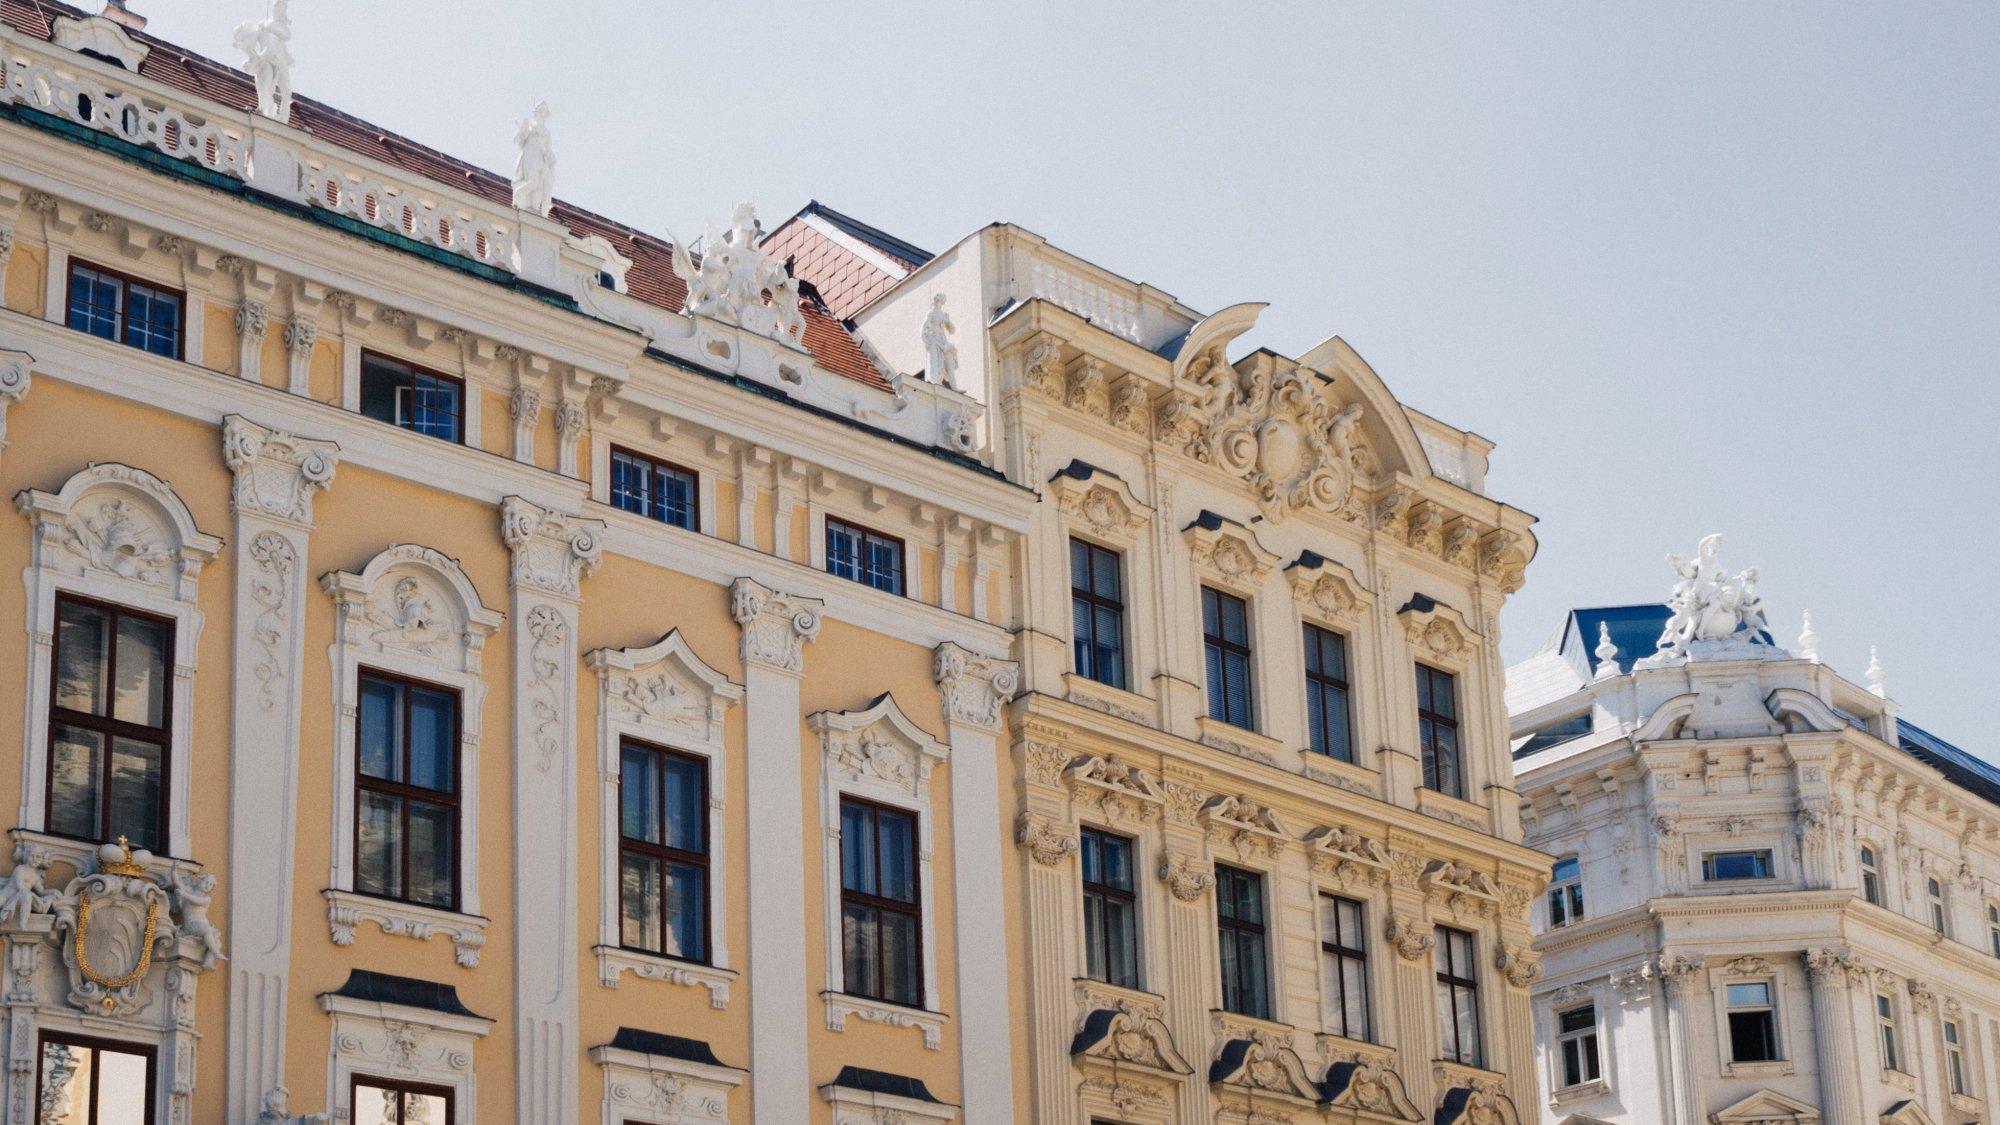 blog-austria-vienna